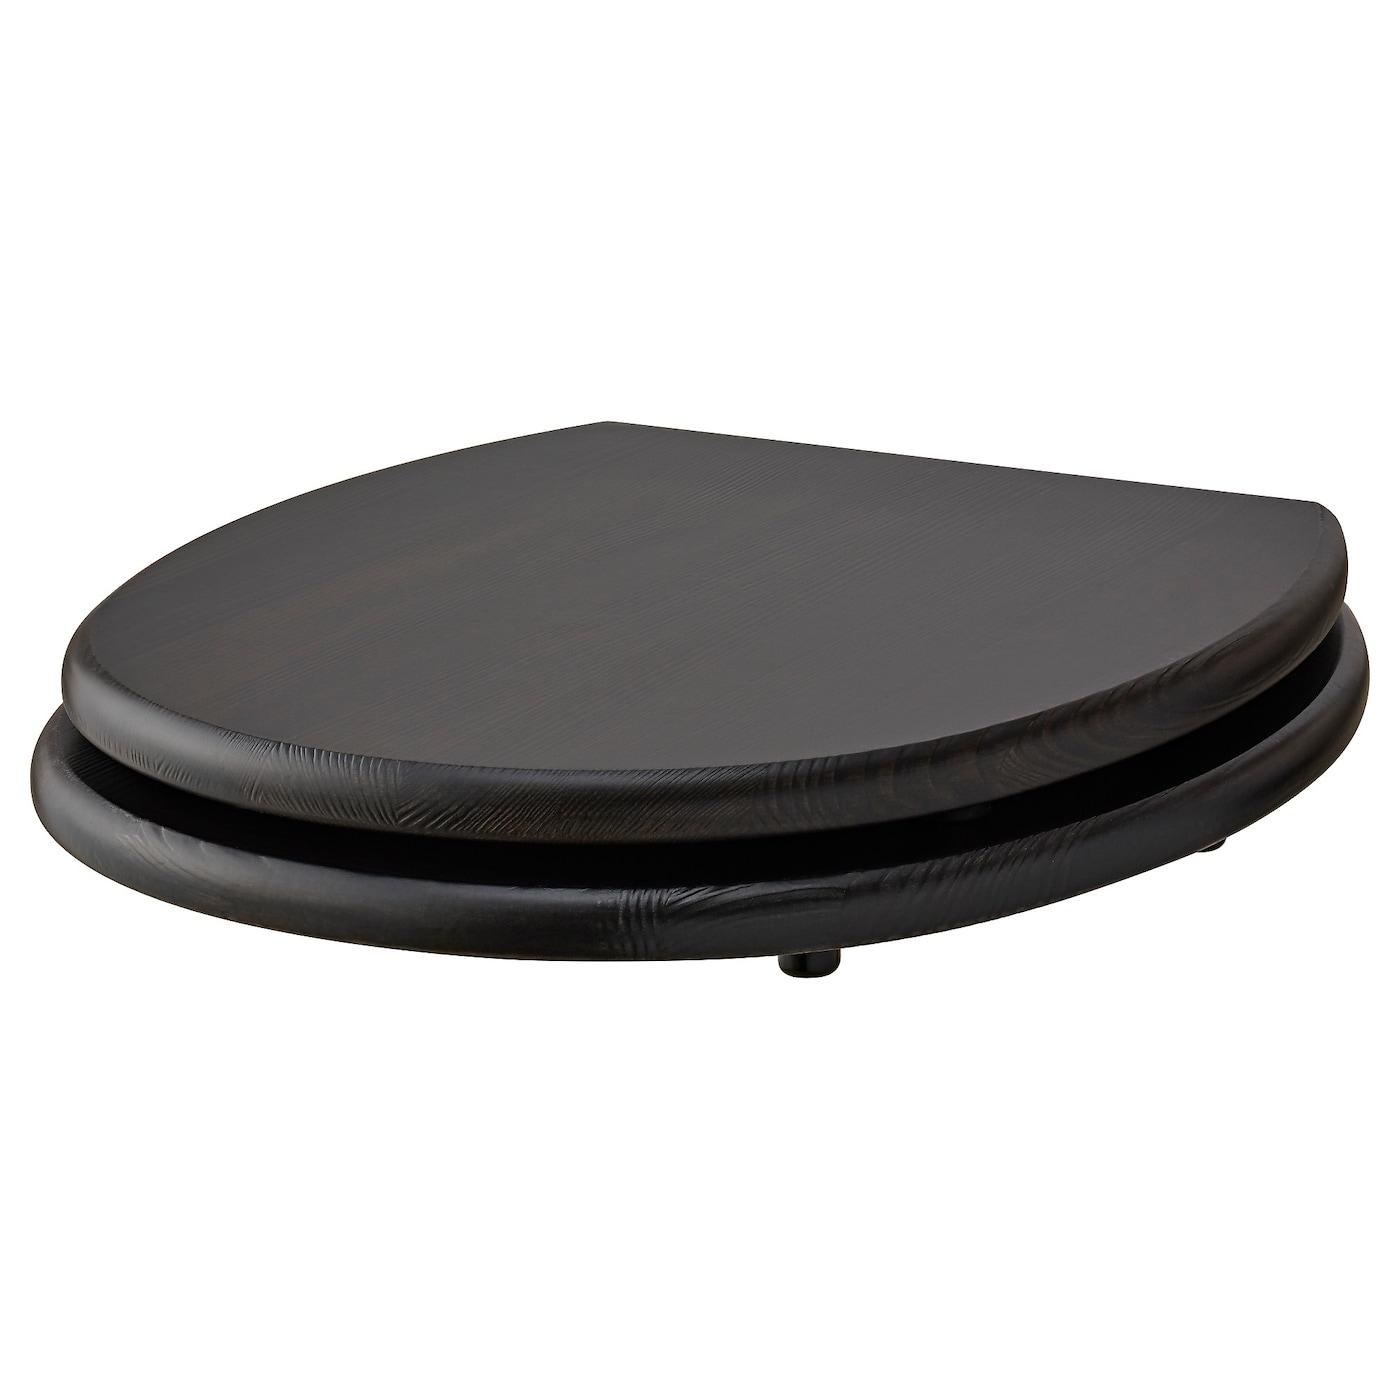 N mmen abattant wc brun noir ikea - Abattant wc taille non standard ...